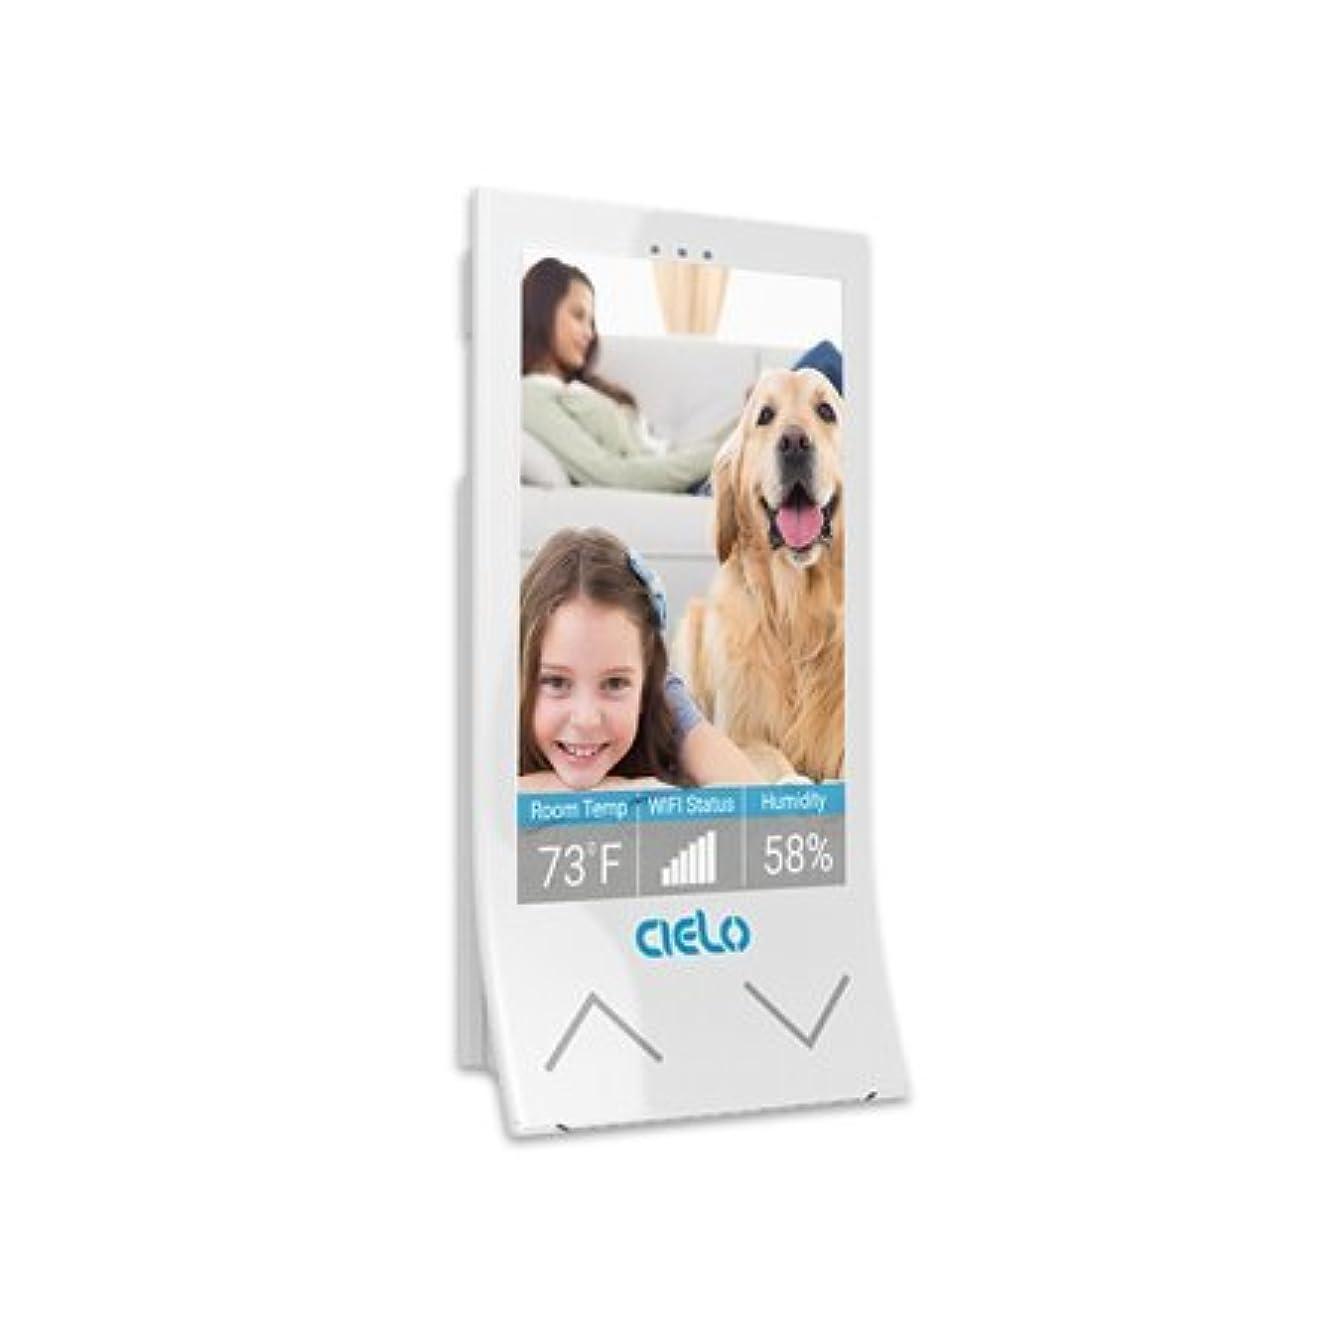 Breez - Mini Split Air Conditioner Smart Thermostat, Wi-Fi Air Conditioner and Heat Pump Controller